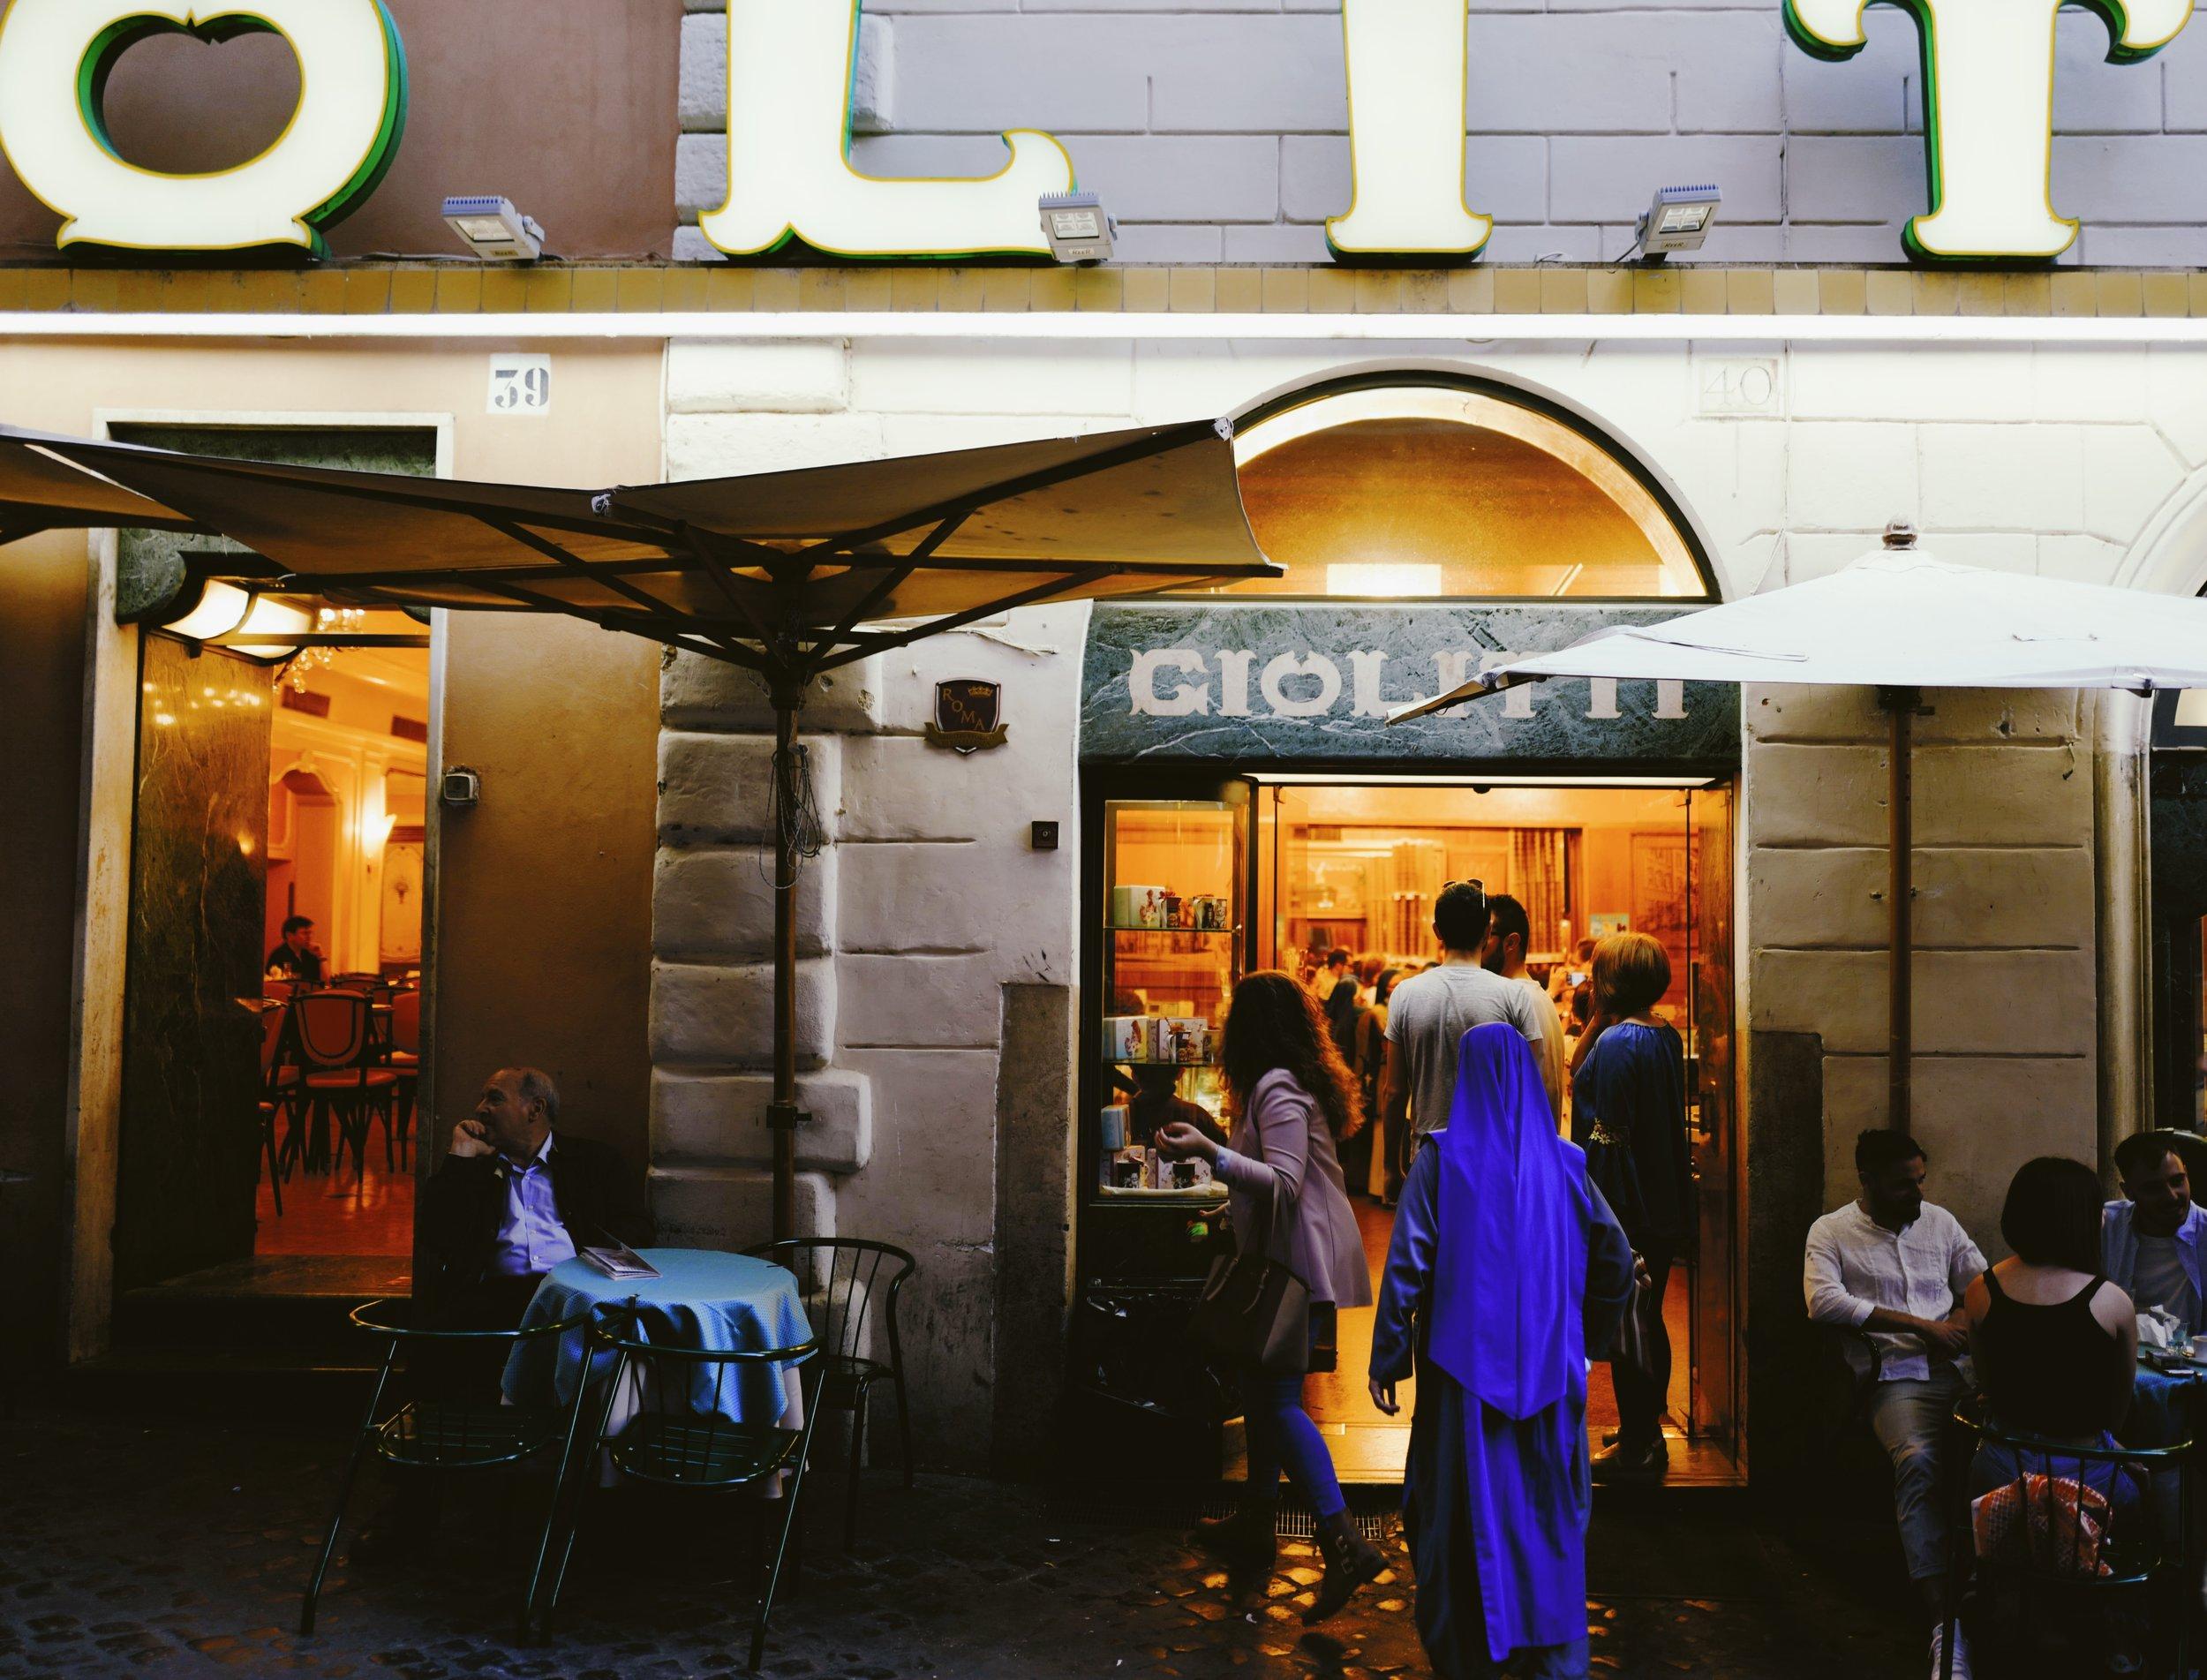 Entrance to Giolitti.